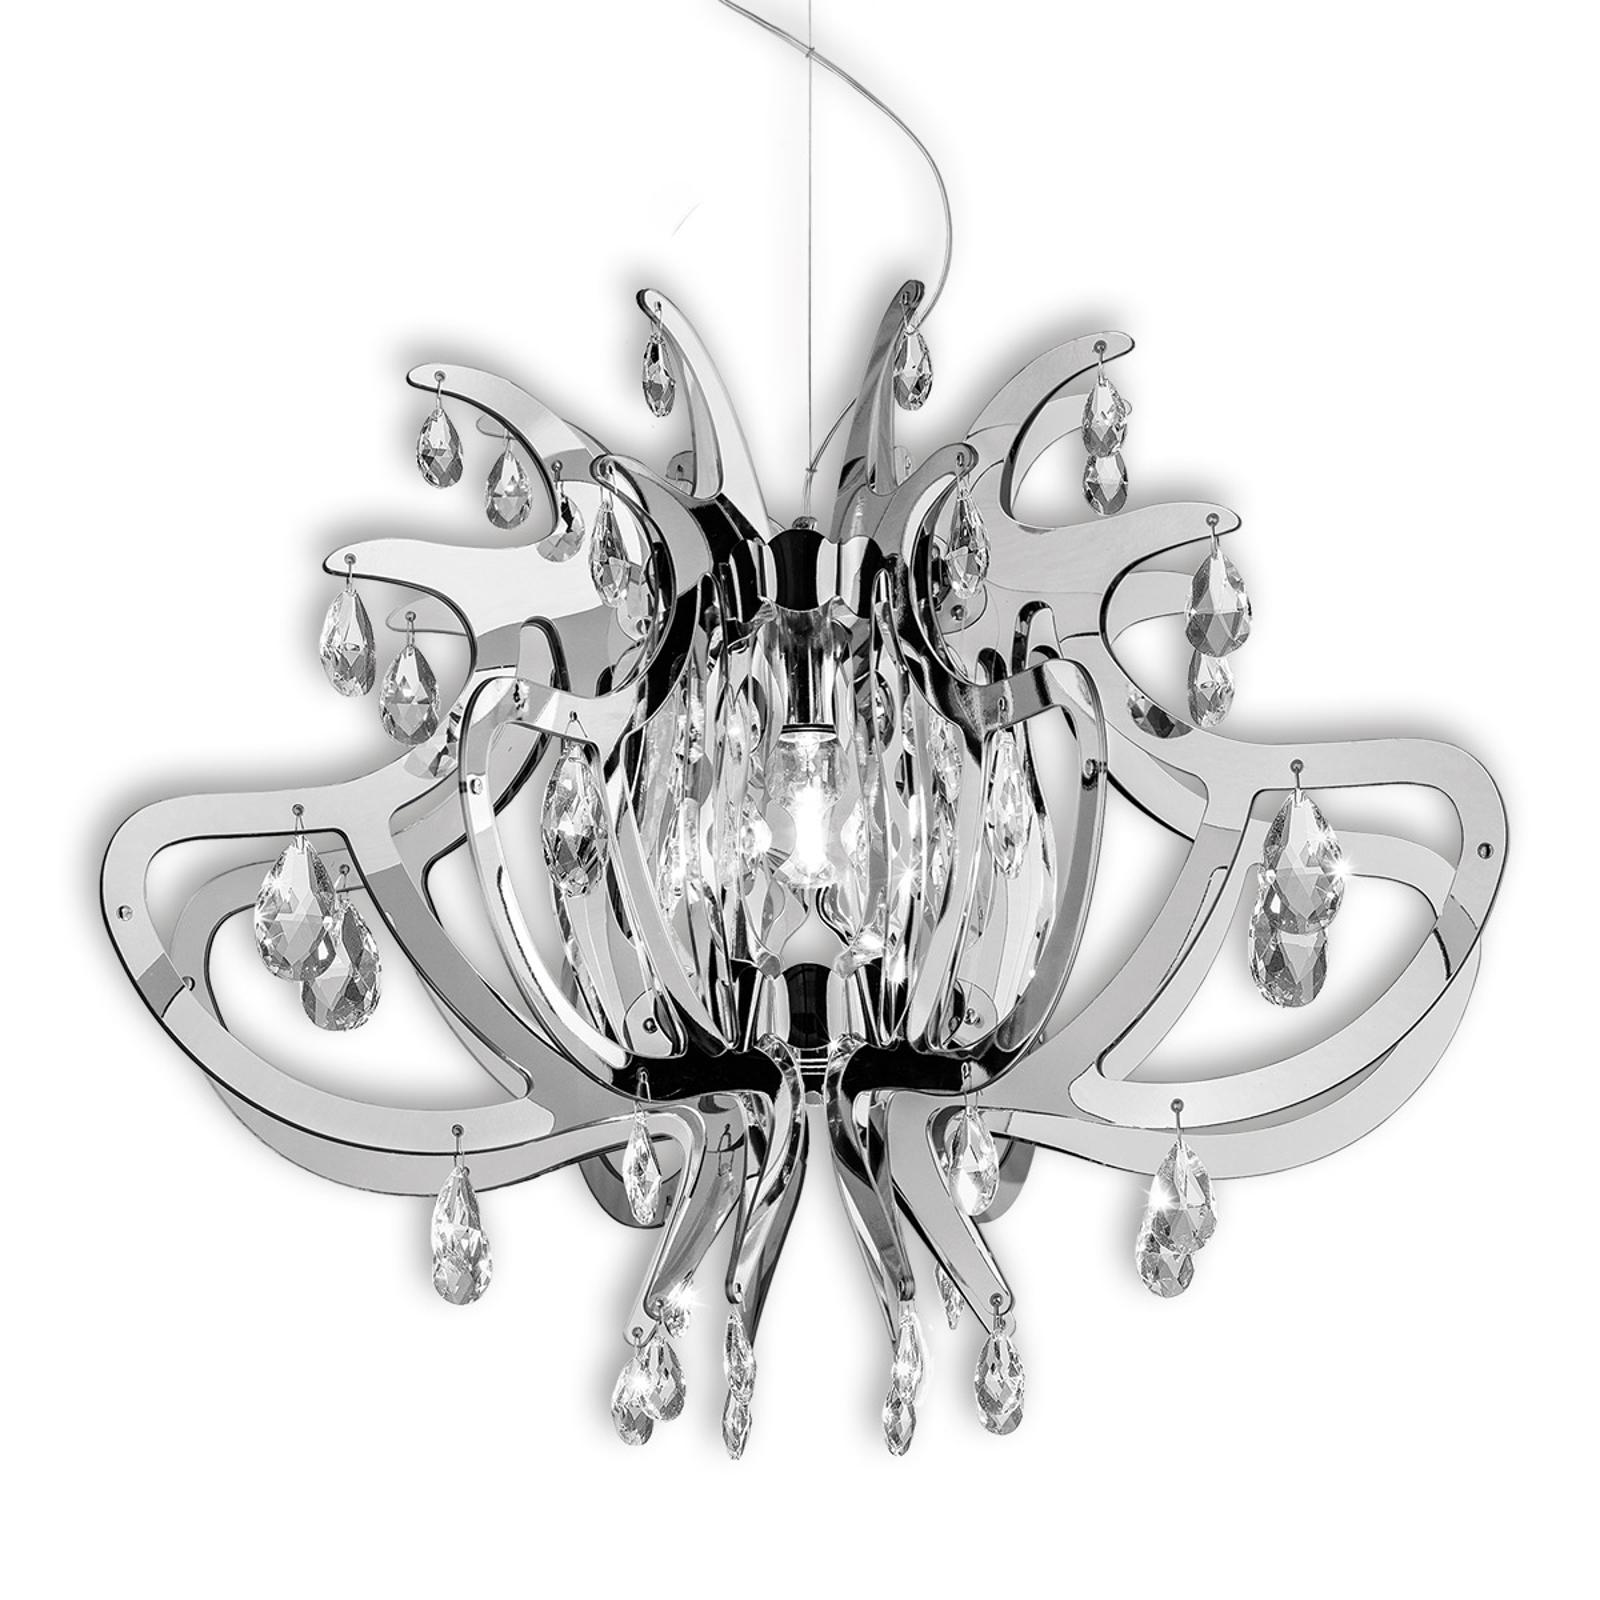 LILLIBET - designerska lampa wisząca, srebrna